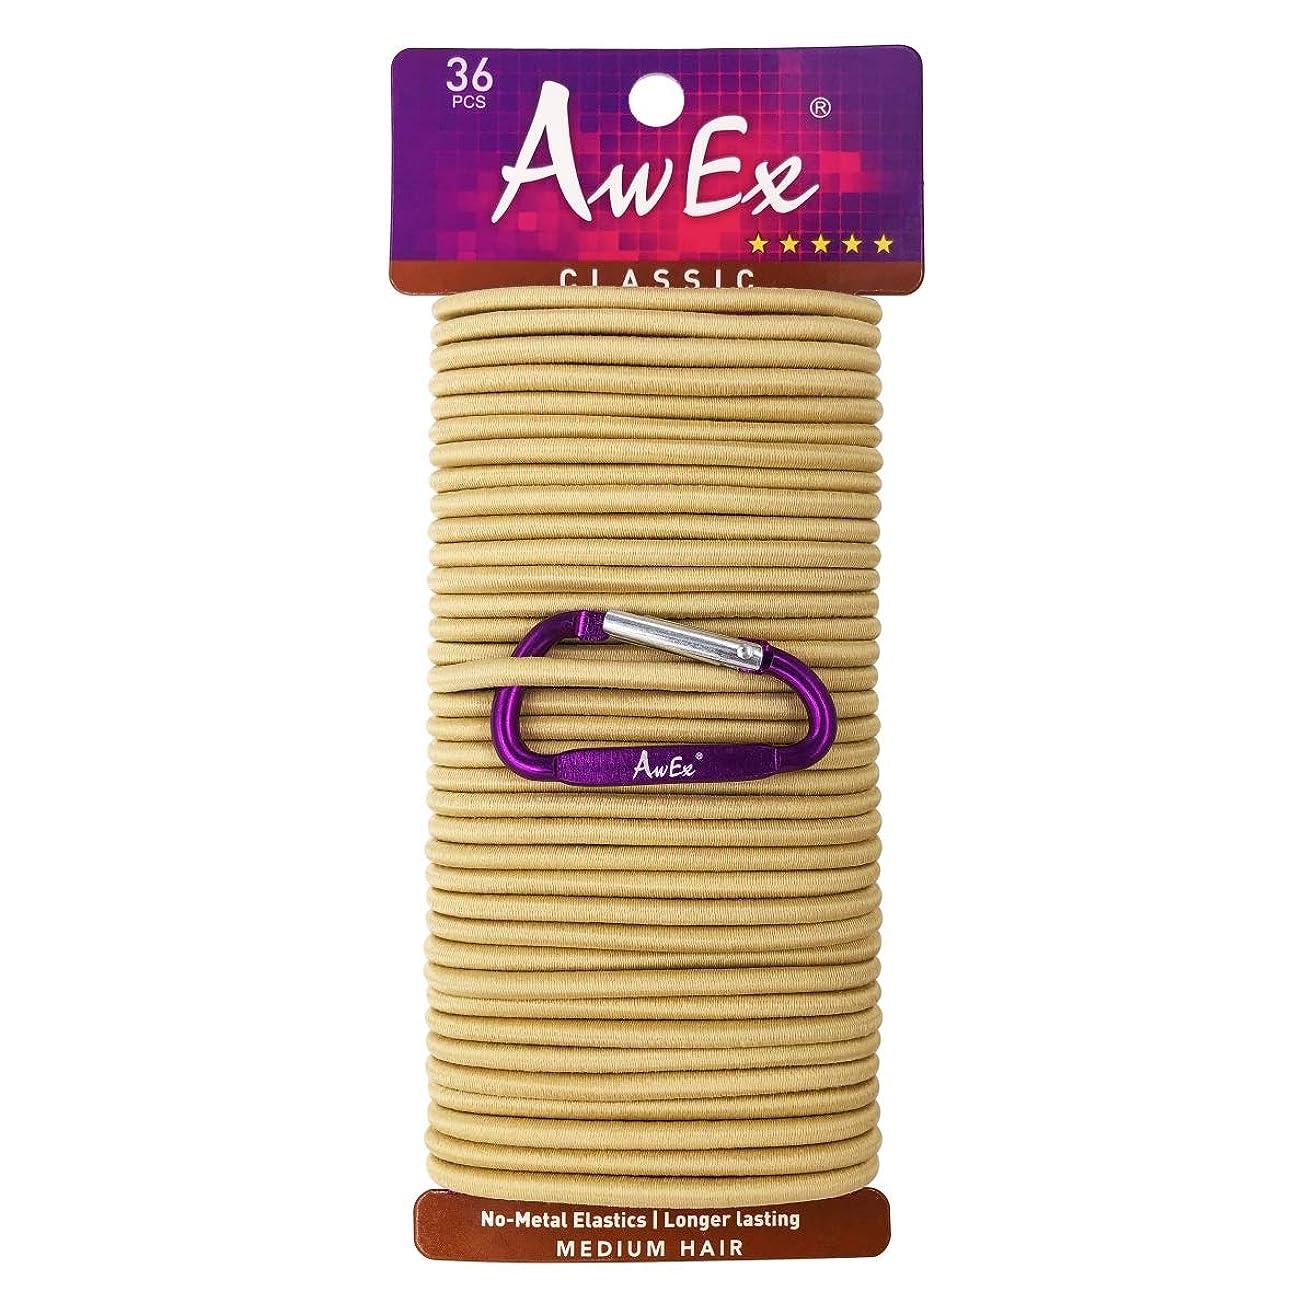 AwEx Strong Blonde Hair Ties,36 PCS,4 mm Size Hair Elastics,No Metal Hair Bands,No Pull Ponytail Holders